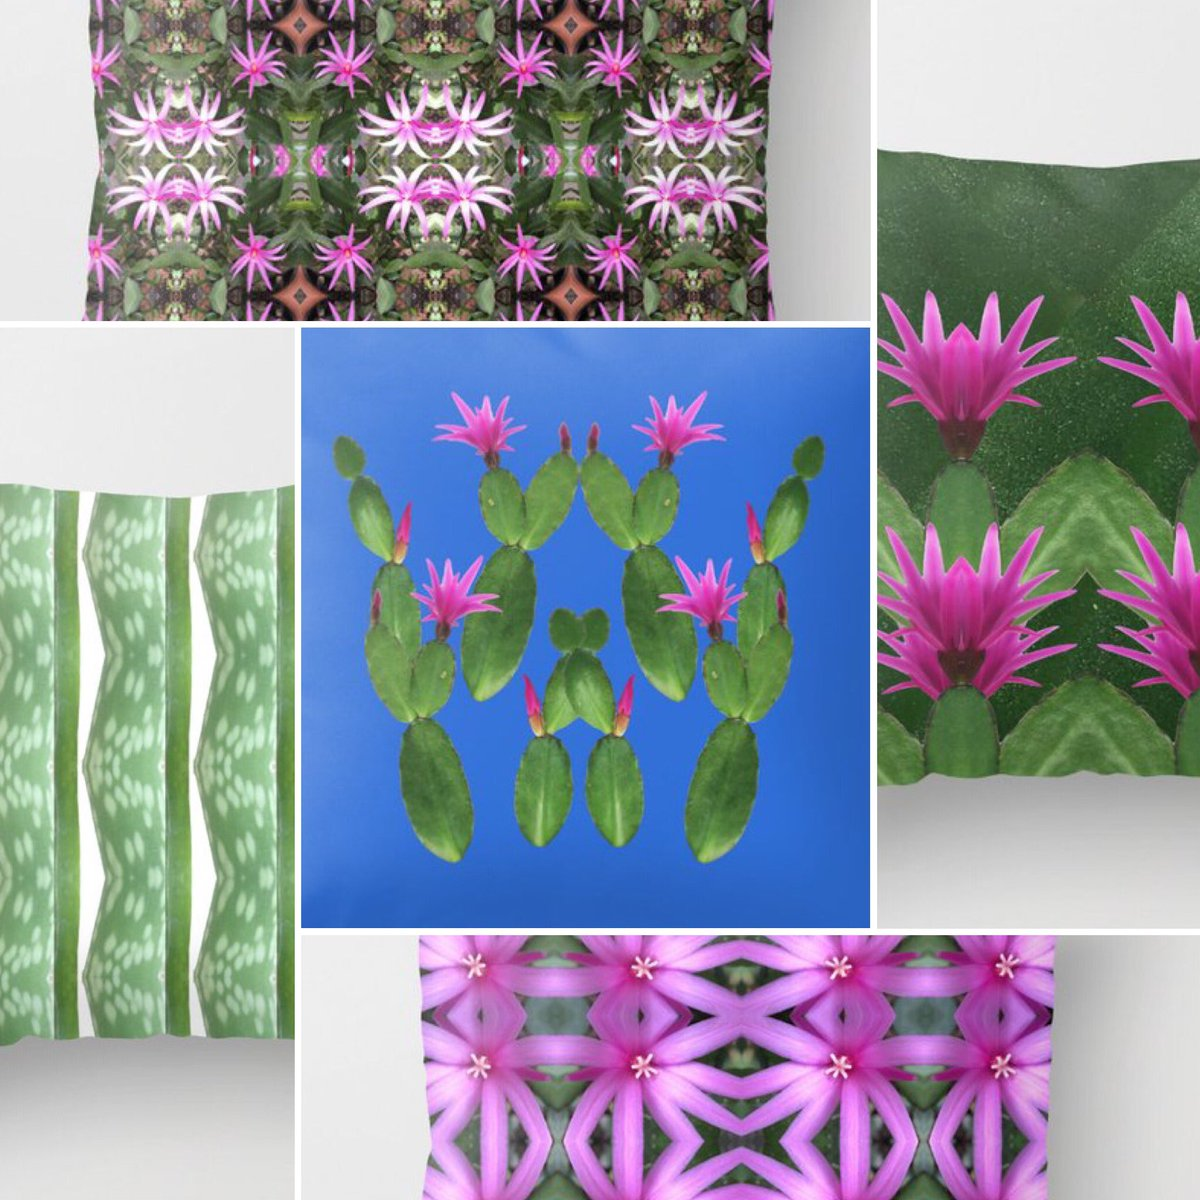 Christmas Cactus Collection  https://t.co/TTz9SpyR85 #colorfulhome #homedecor #Christmas2020 #art #christmasiscoming #photographer #society6 #BlackFriday2020 #BlackFriday #giftideas #holidayseason #shopsmallbusiness #CyberMonday #artistsontwitter https://t.co/s2zcM65Ao3